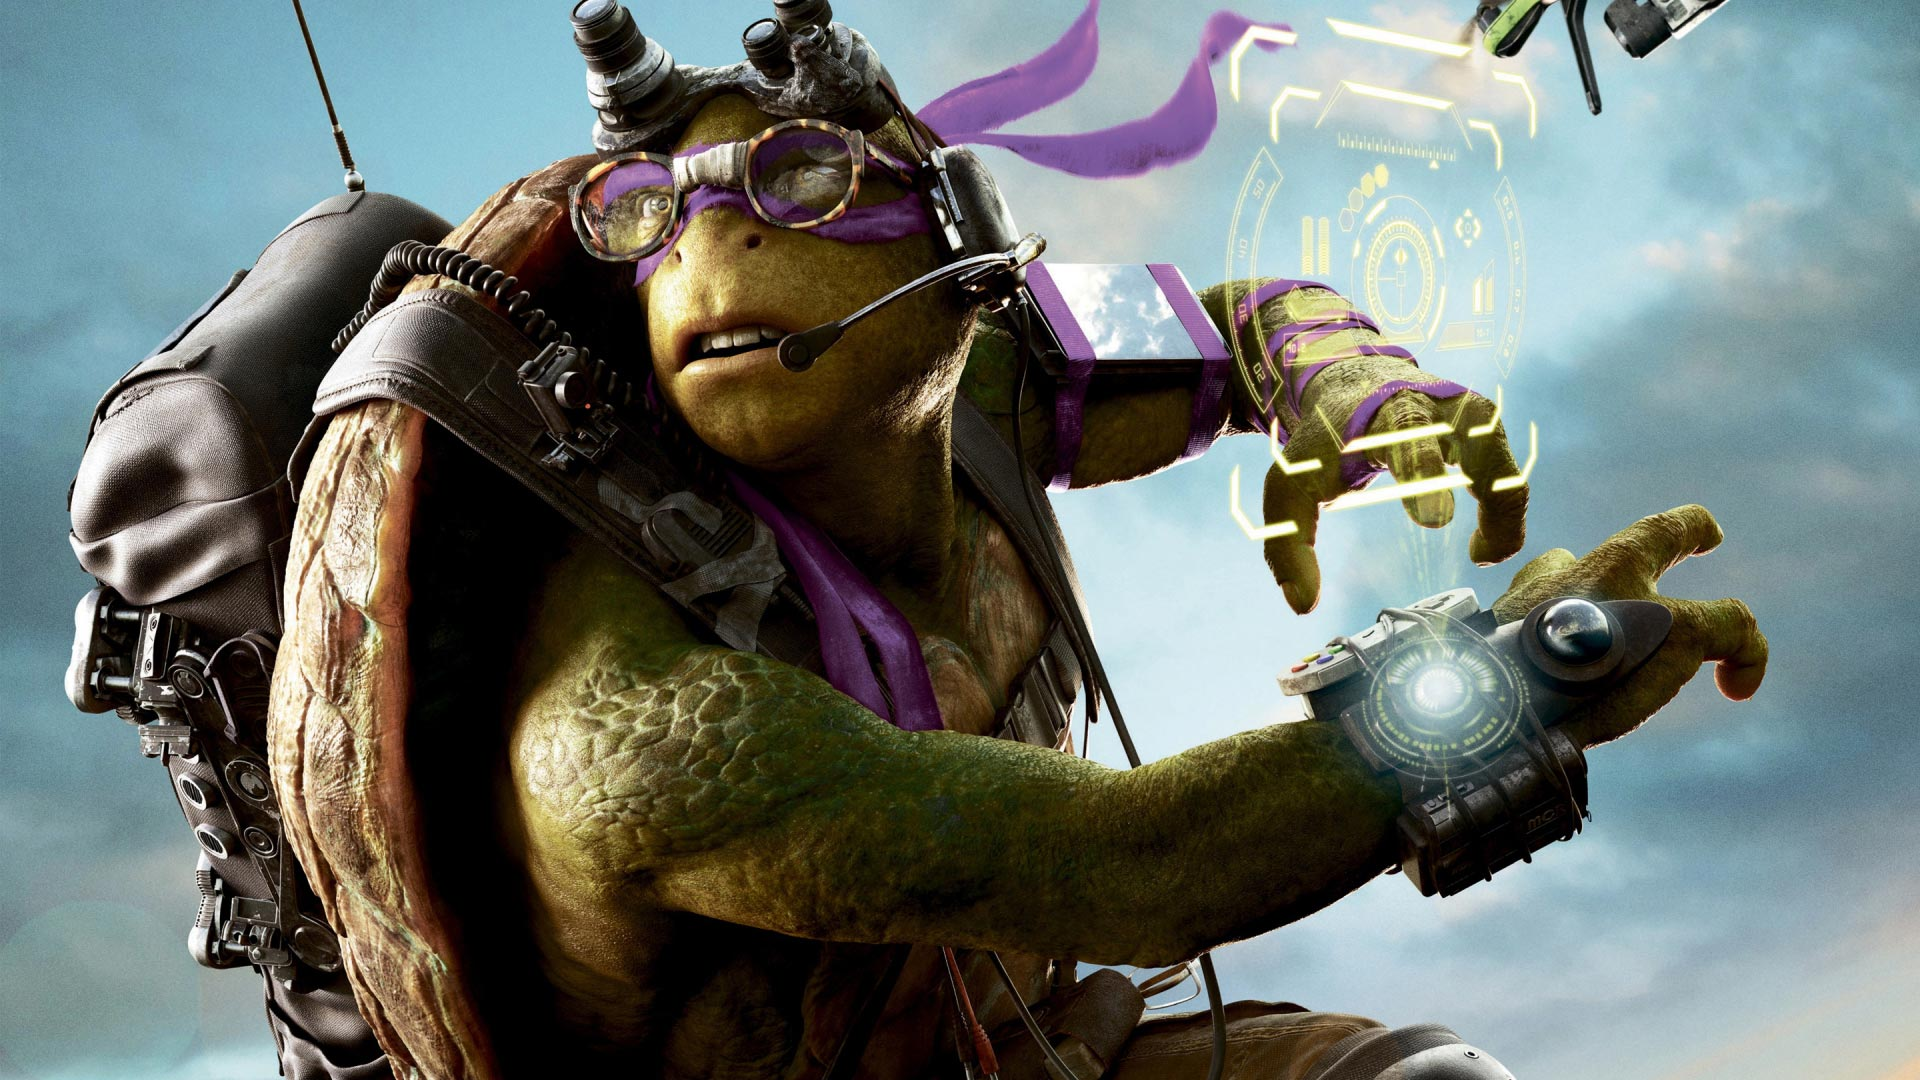 Teenage Mutant Ninja Turtles Out of the Shadows Screencaps Movie